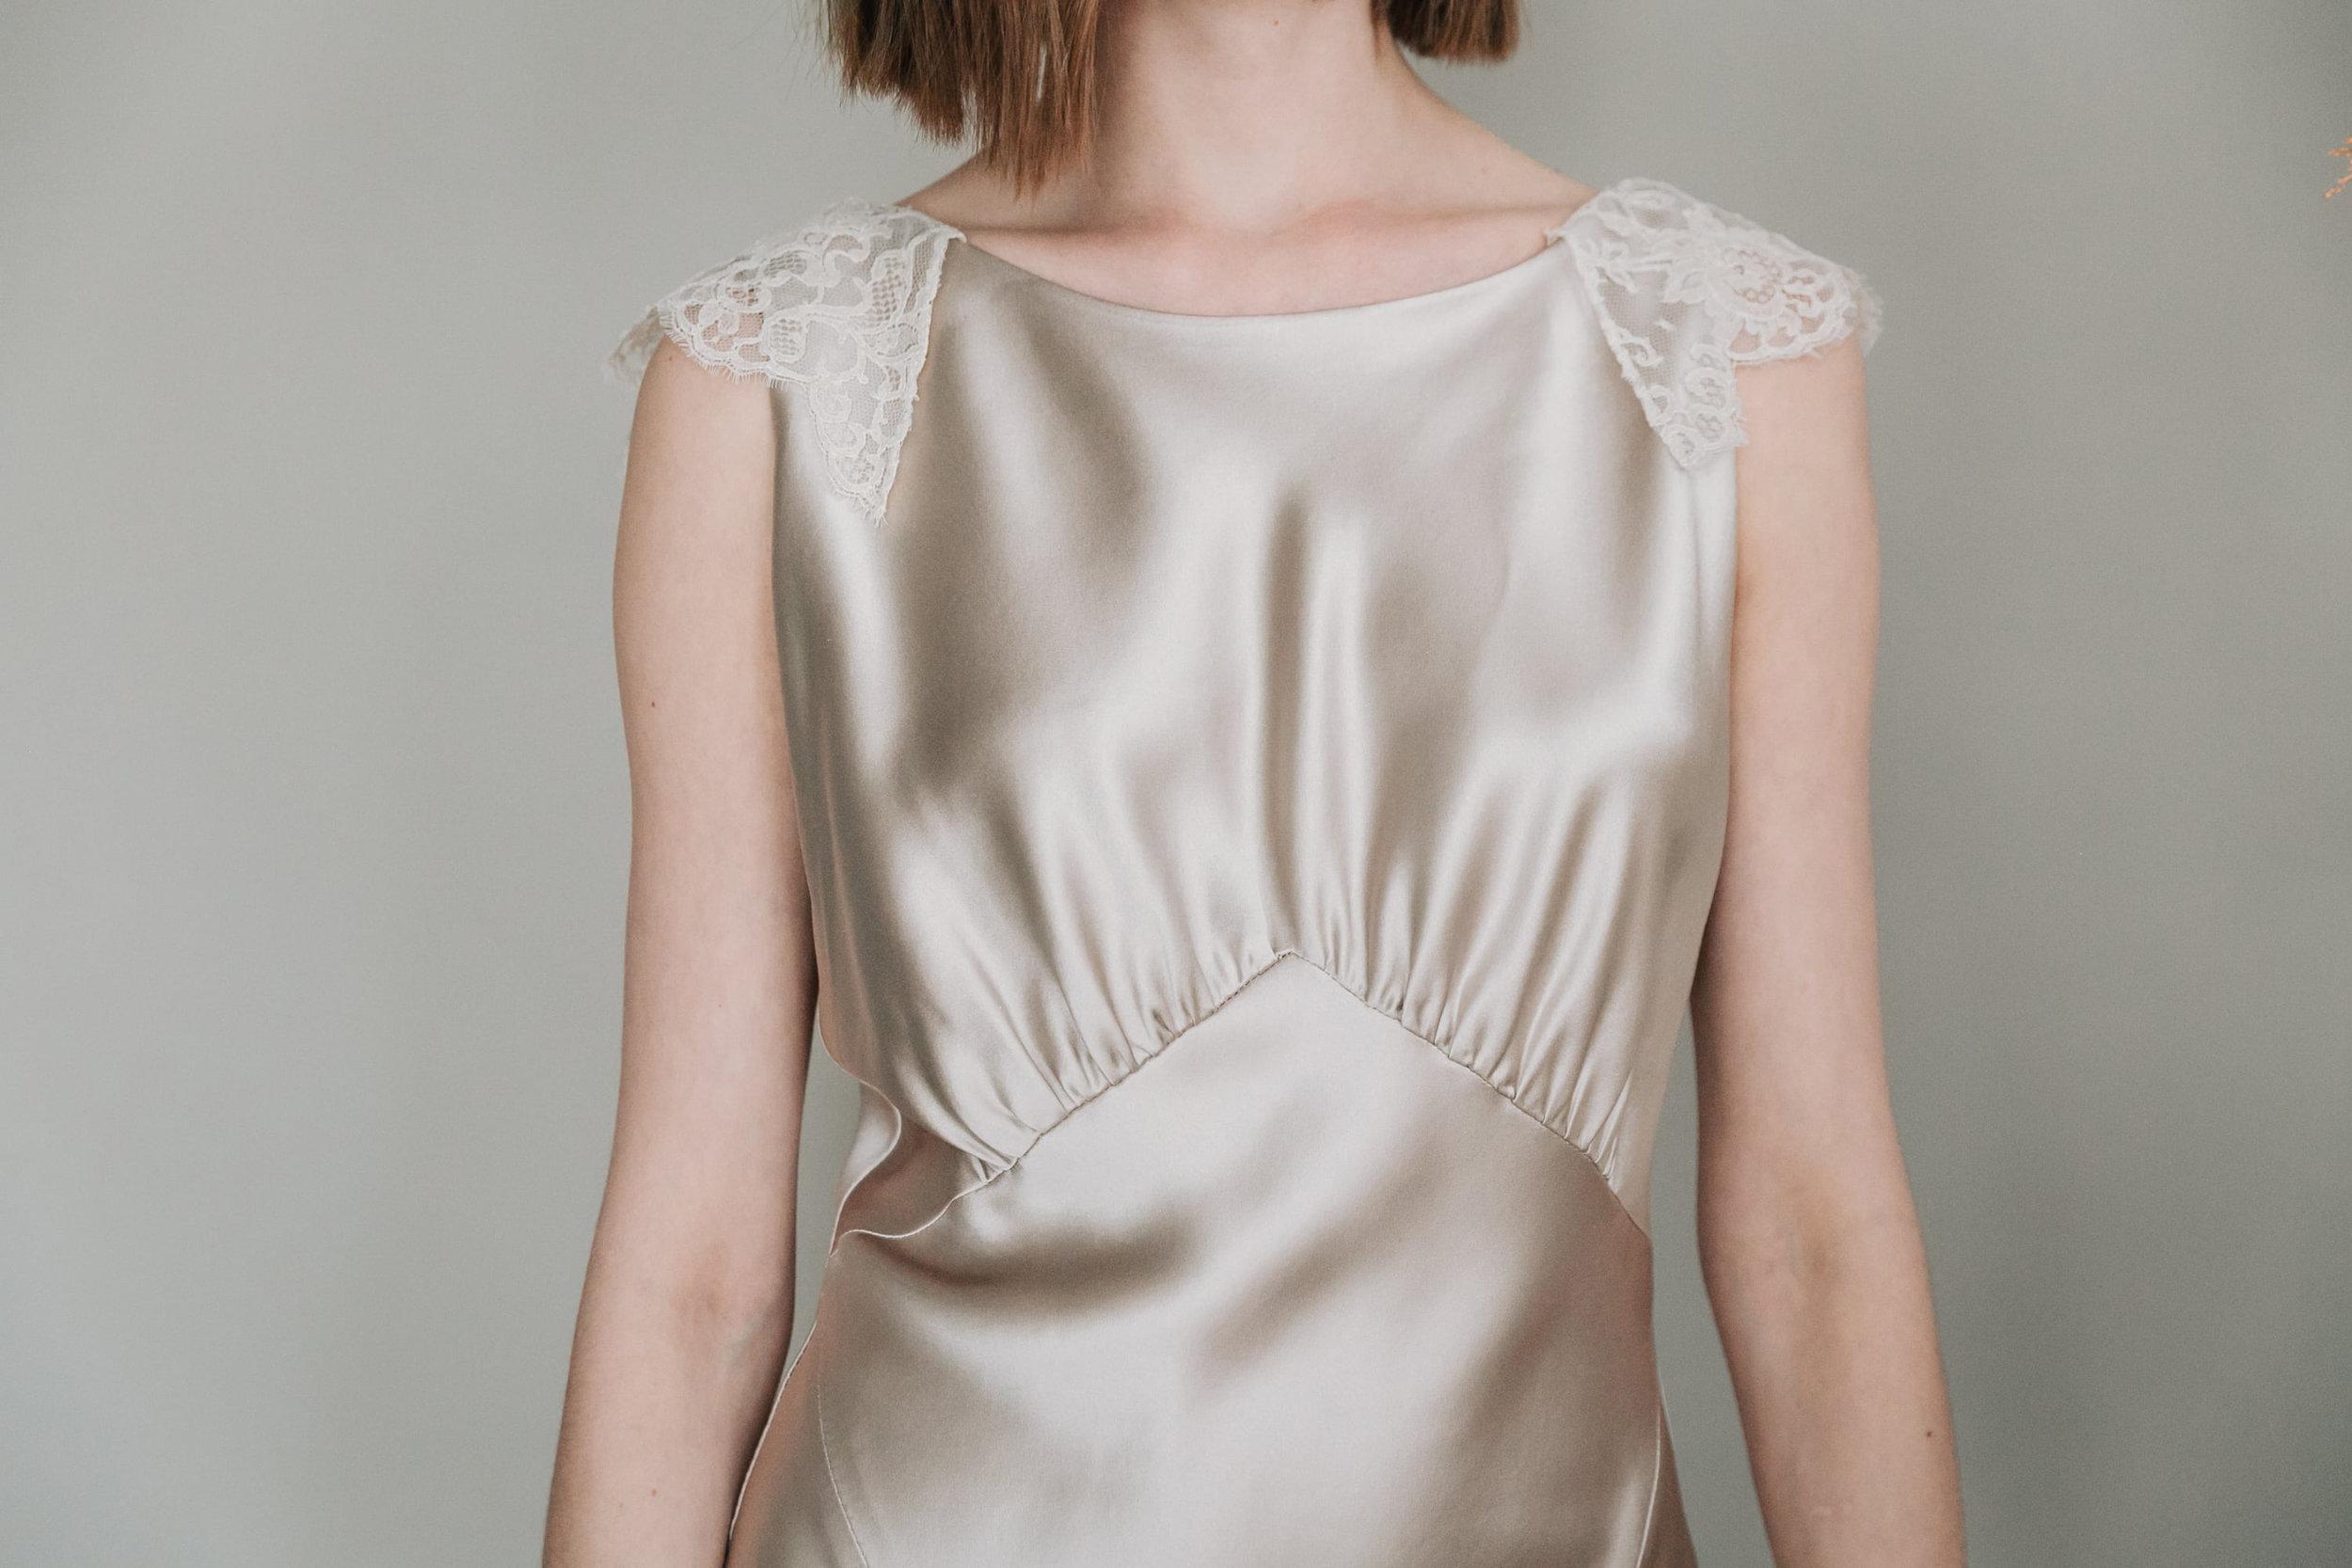 Kate-Beaumont-Sheffield-Honeysuckle-Bias-Cut-Silk-Panelled-Wedding-Gown-3.jpg